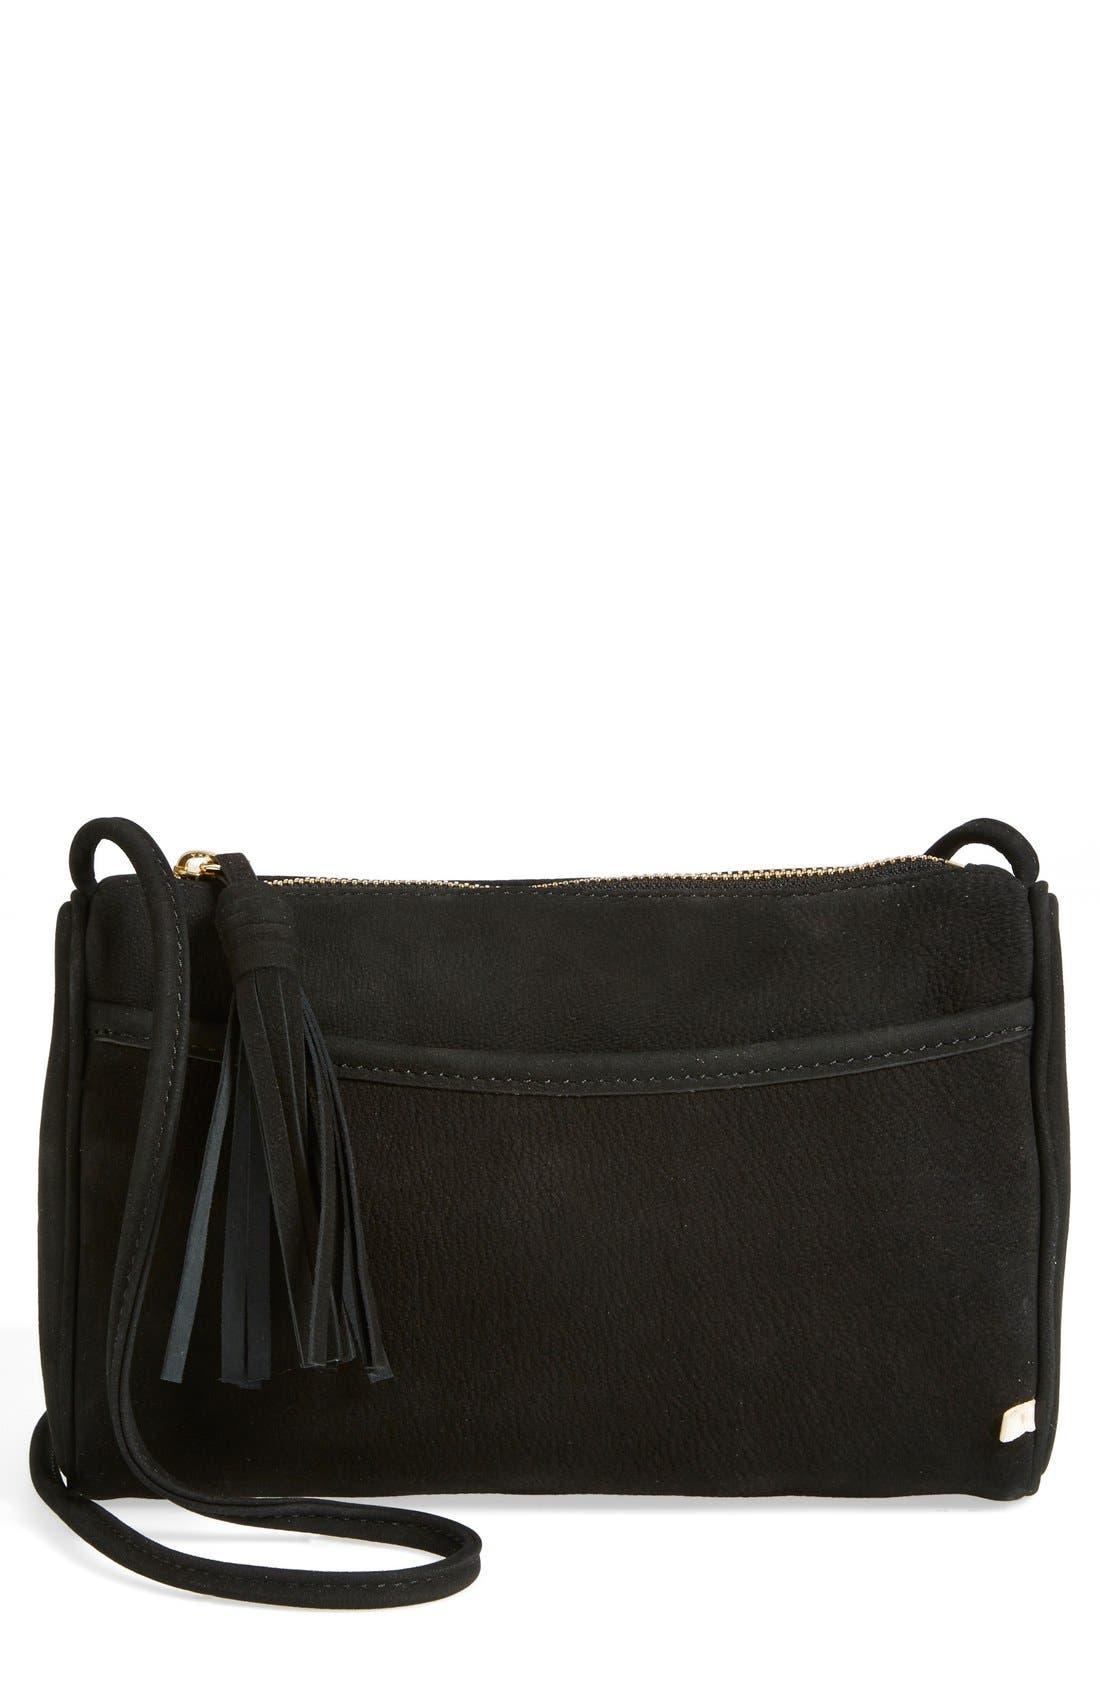 Alternate Image 1 Selected - SJP by Sarah Jessica Parker 'Crosstown' Nubuck Crossbody Bag